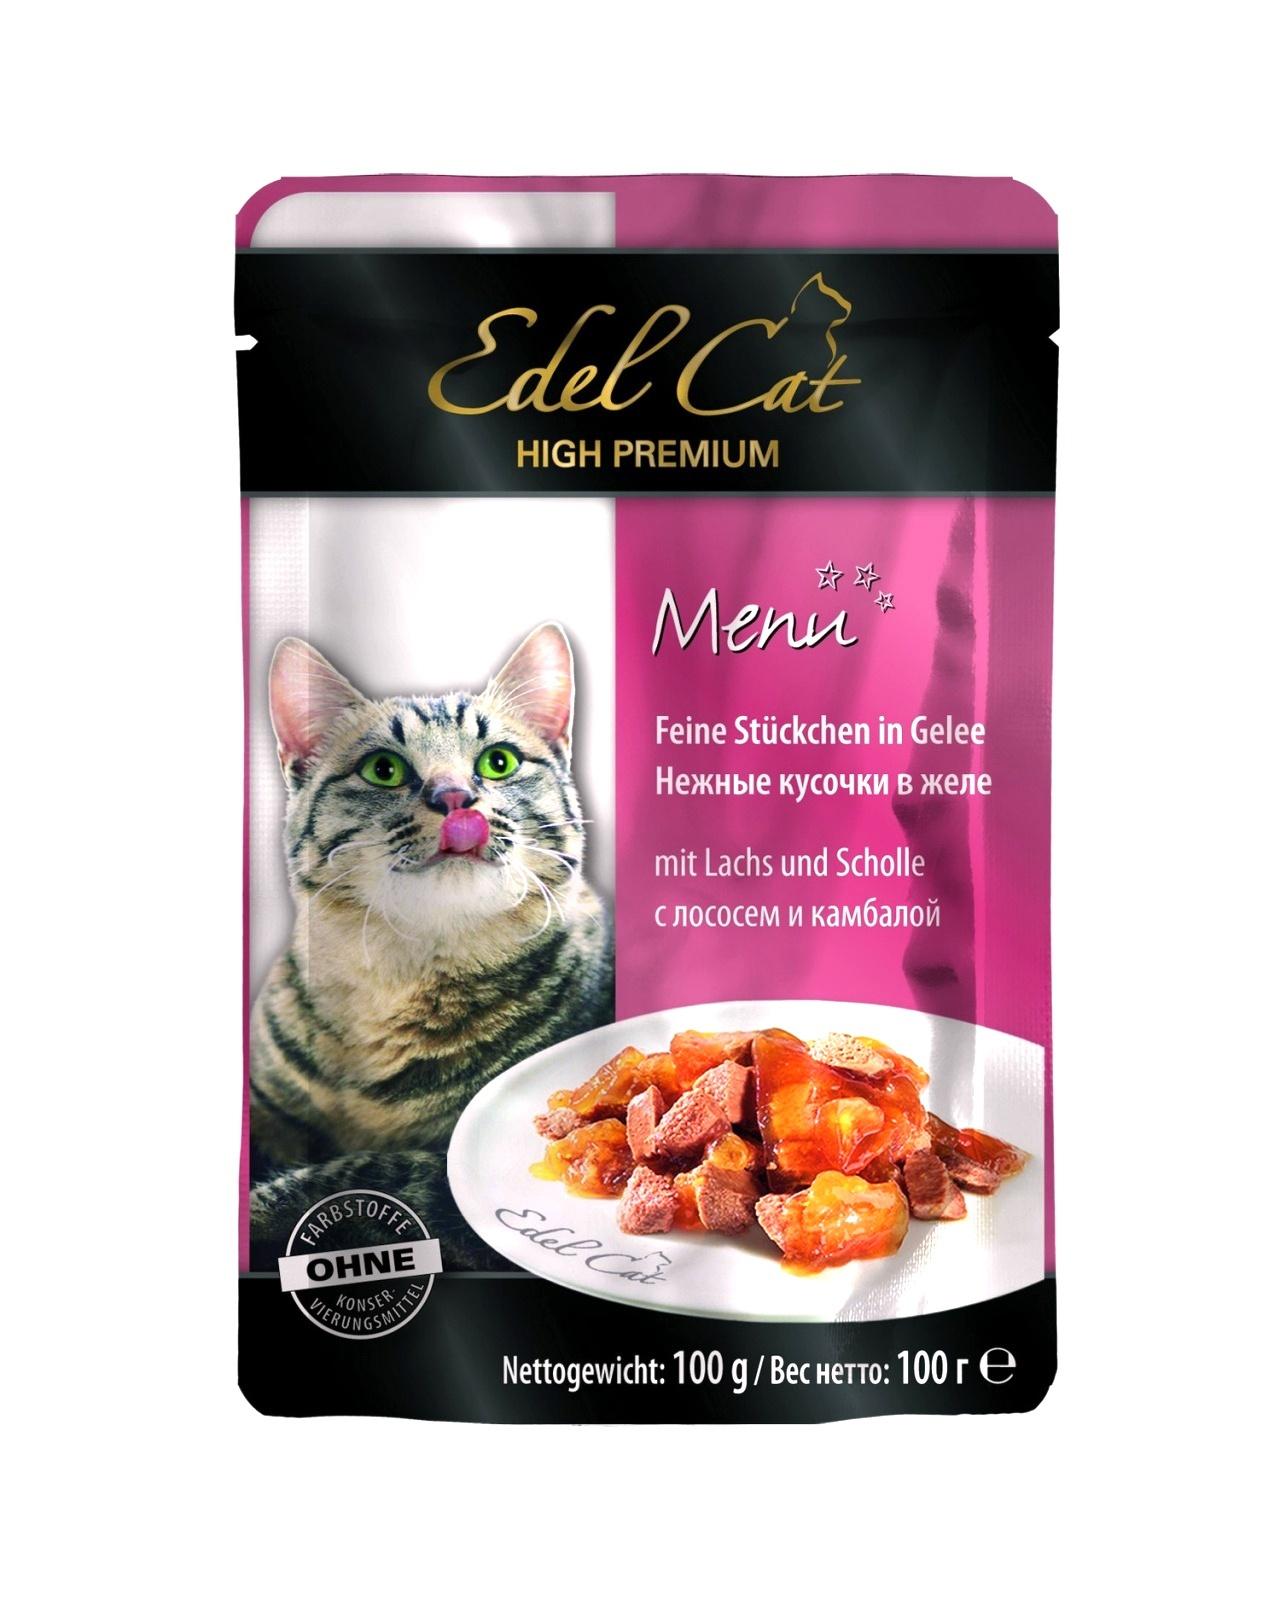 Edel Cat Паучи Кусочки в желе с лососем и камбалой (100 г)